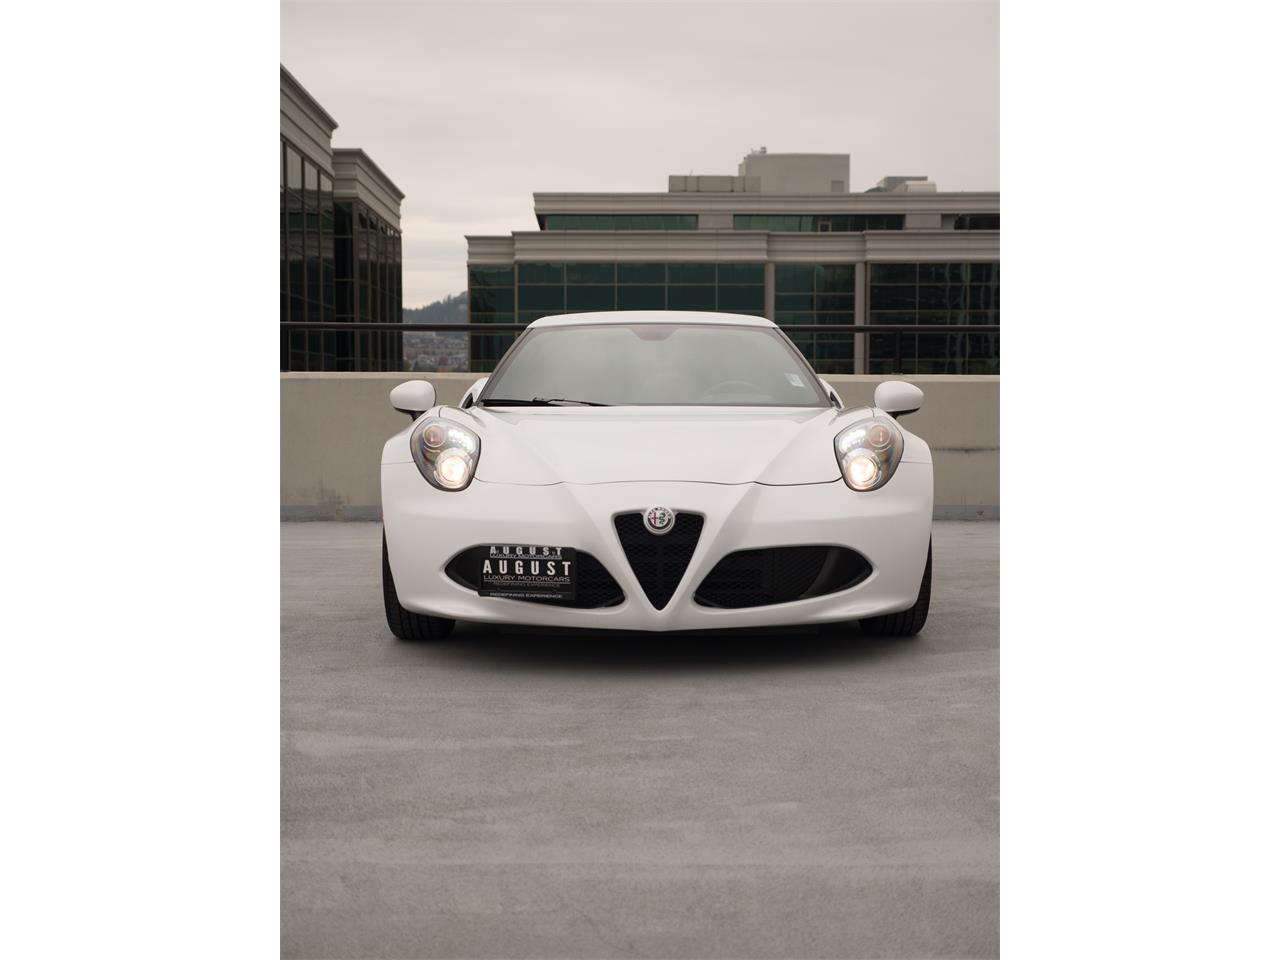 2017 Alfa Romeo 4C (CC-1302640) for sale in Kelowna, British Columbia